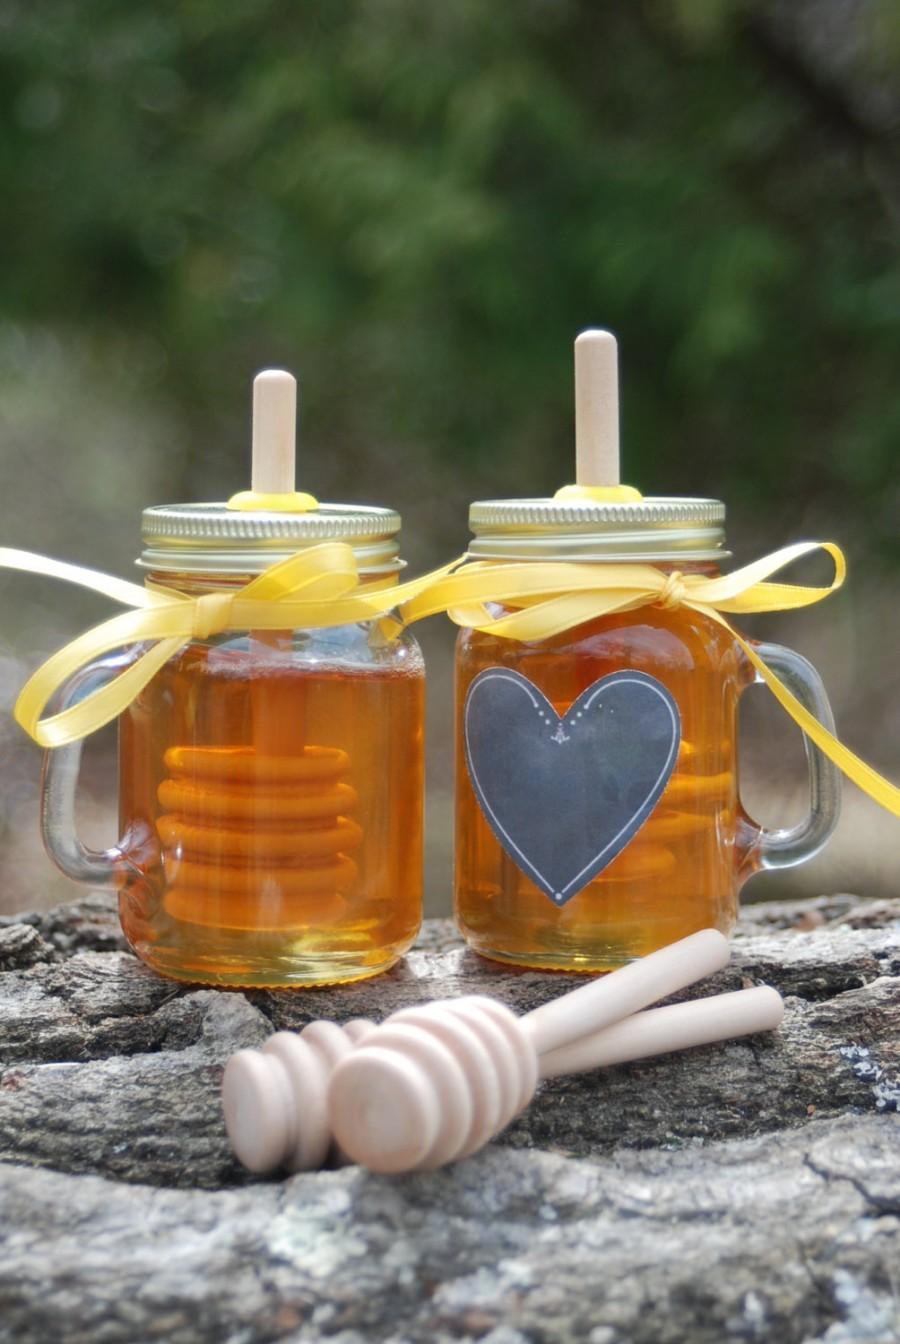 Mariage - Mini Mason Jar Cup Mug Honey Jar with Birch Dipper, Wedding Mason Jar, Party Favor, Bridal Shower, Christmas Gift, Stocking Stuffer